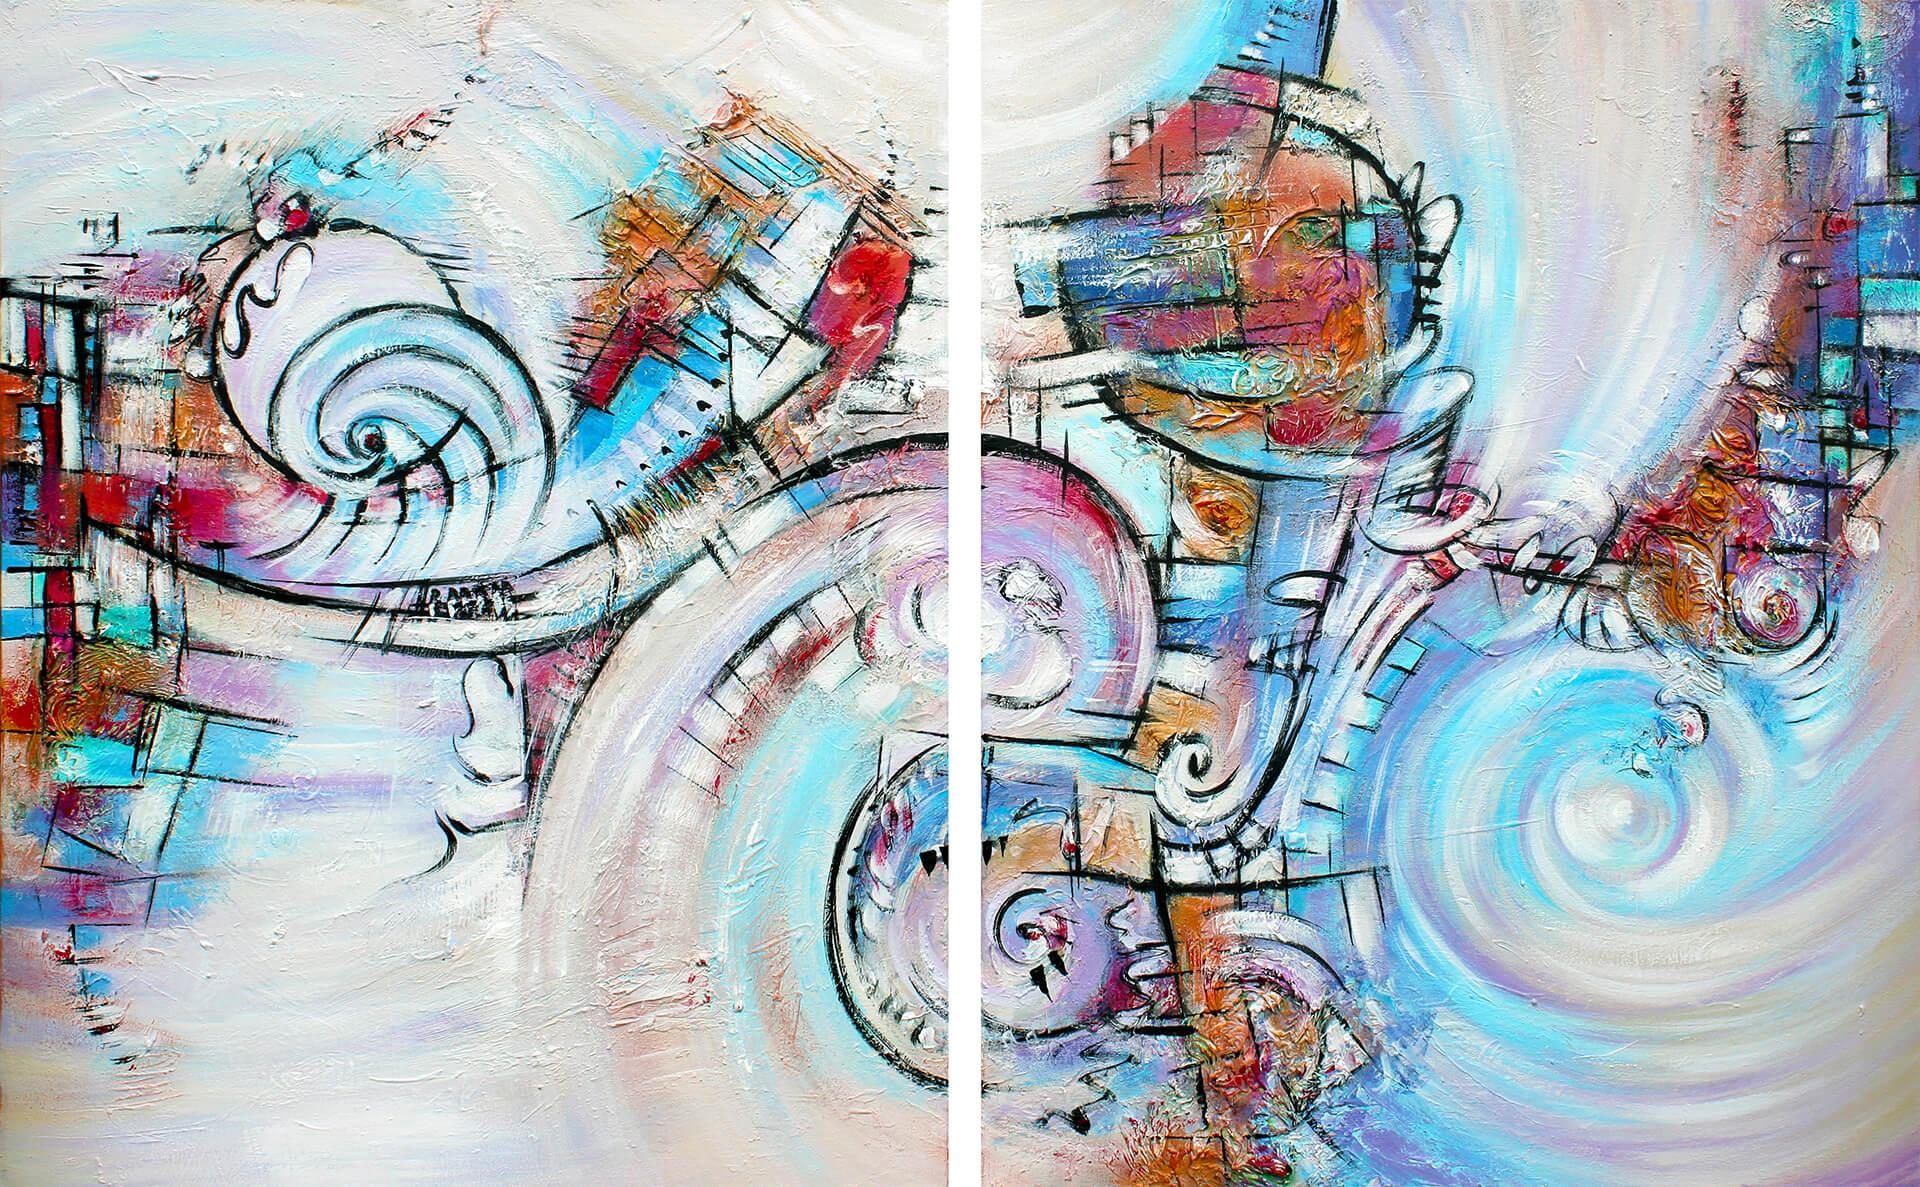 art-eric-j-hughes-artiste-peintre-canadien-tableau-symbiose-diptyque-osmose-ab